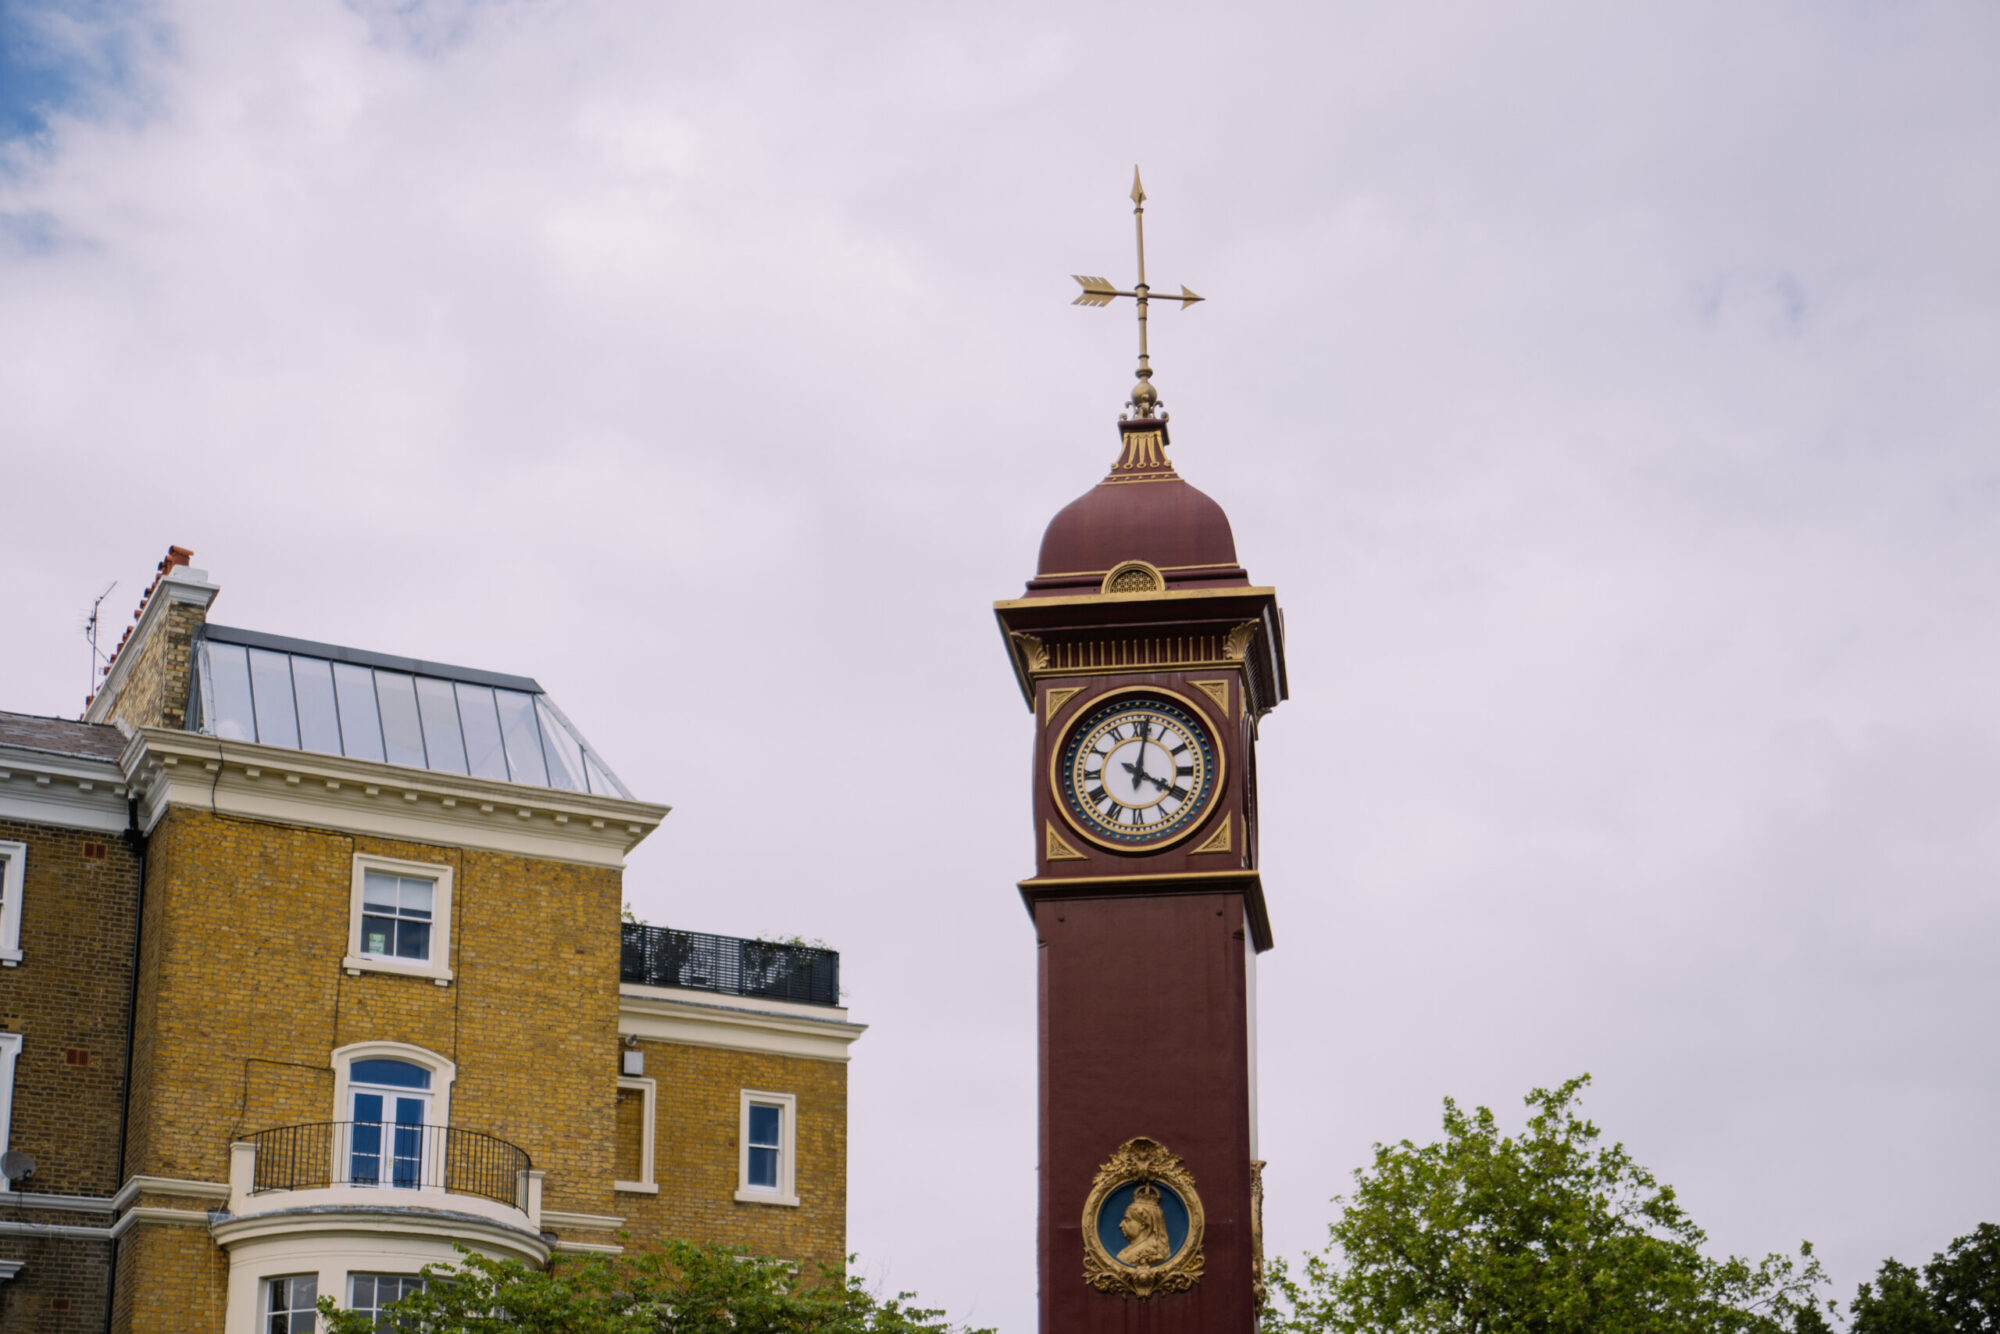 A clock tower in Highbury.